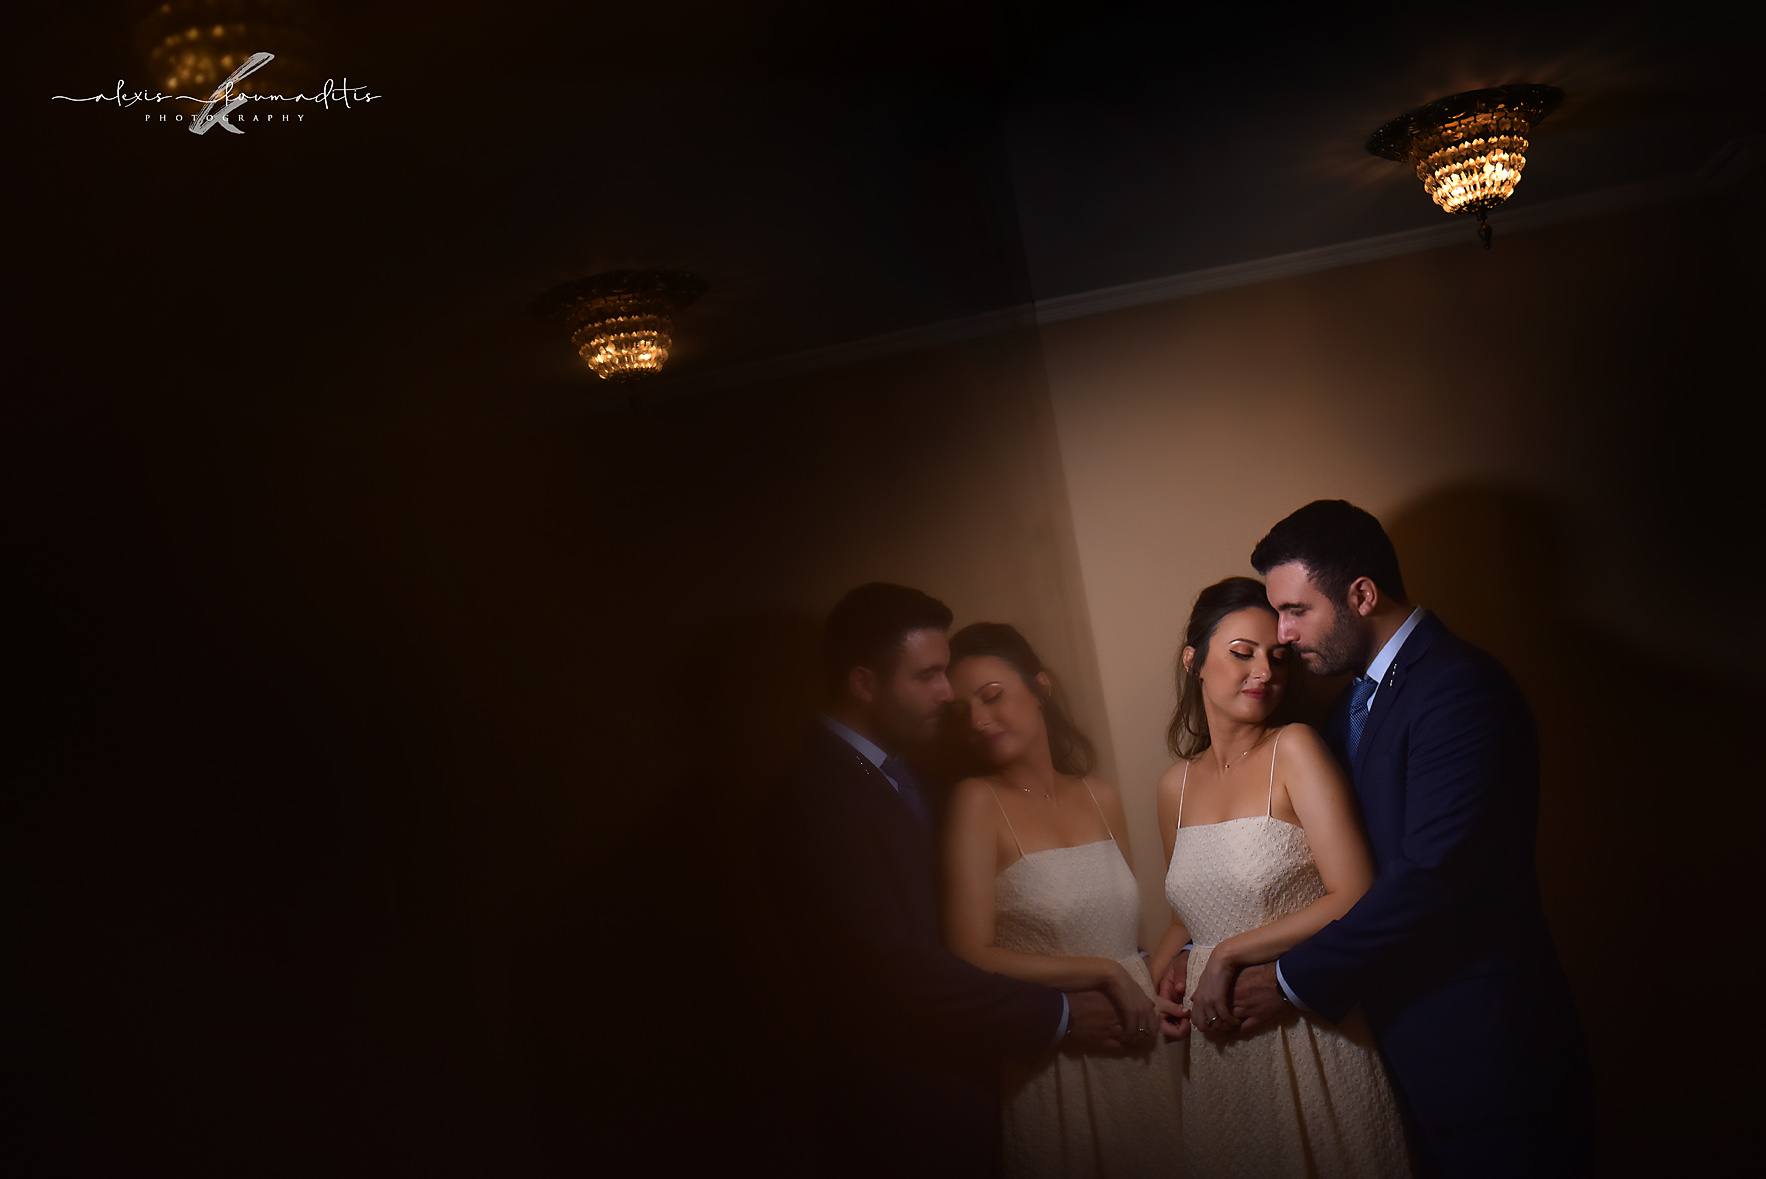 wedding-photography-love-bride-groom-alexis-koumaditis